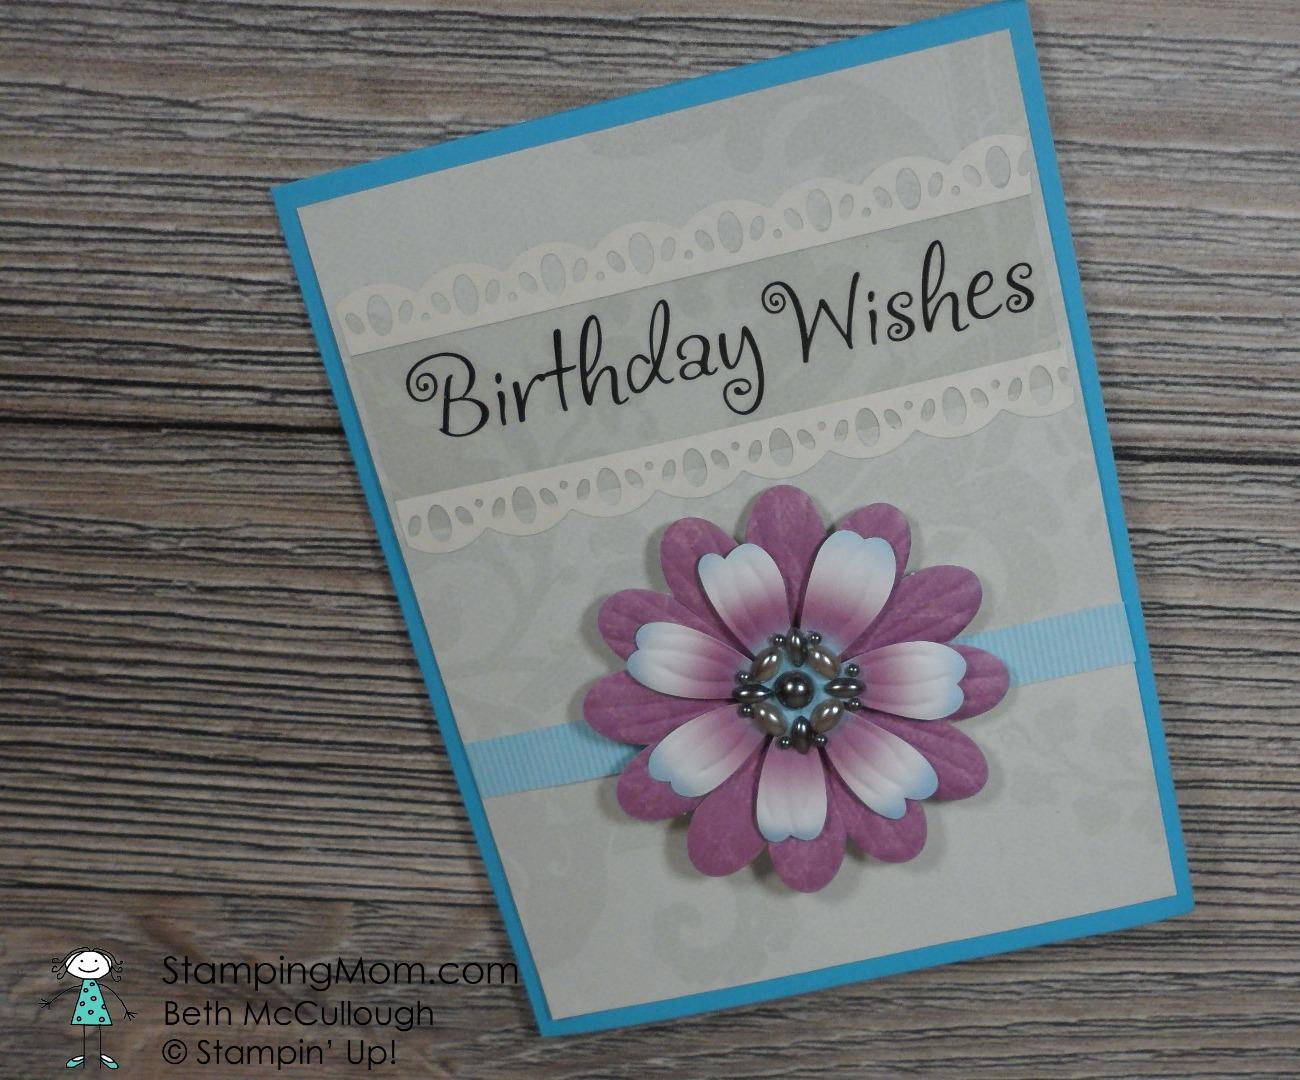 My homemade birthday cards – Stamping Mom